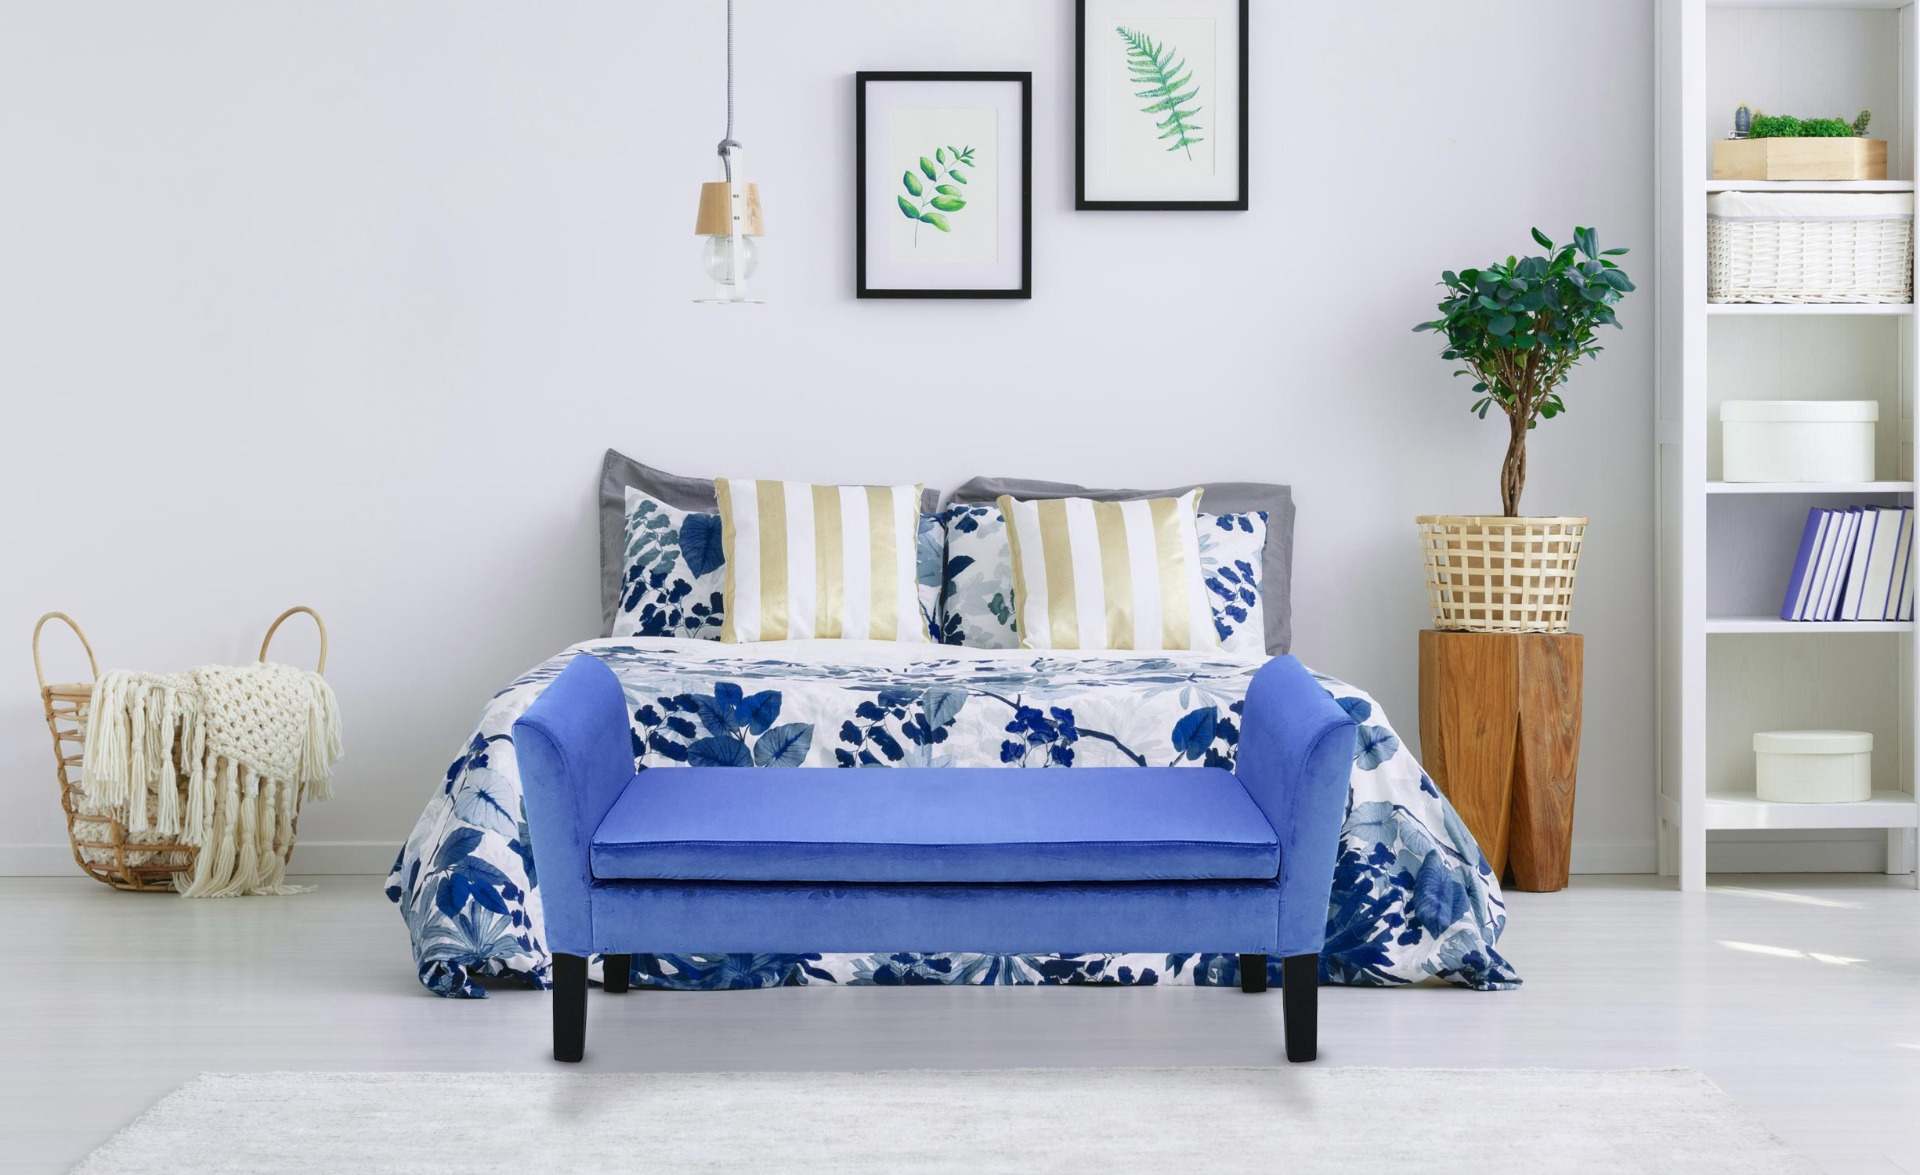 Cassapanca Idor in velluto blu